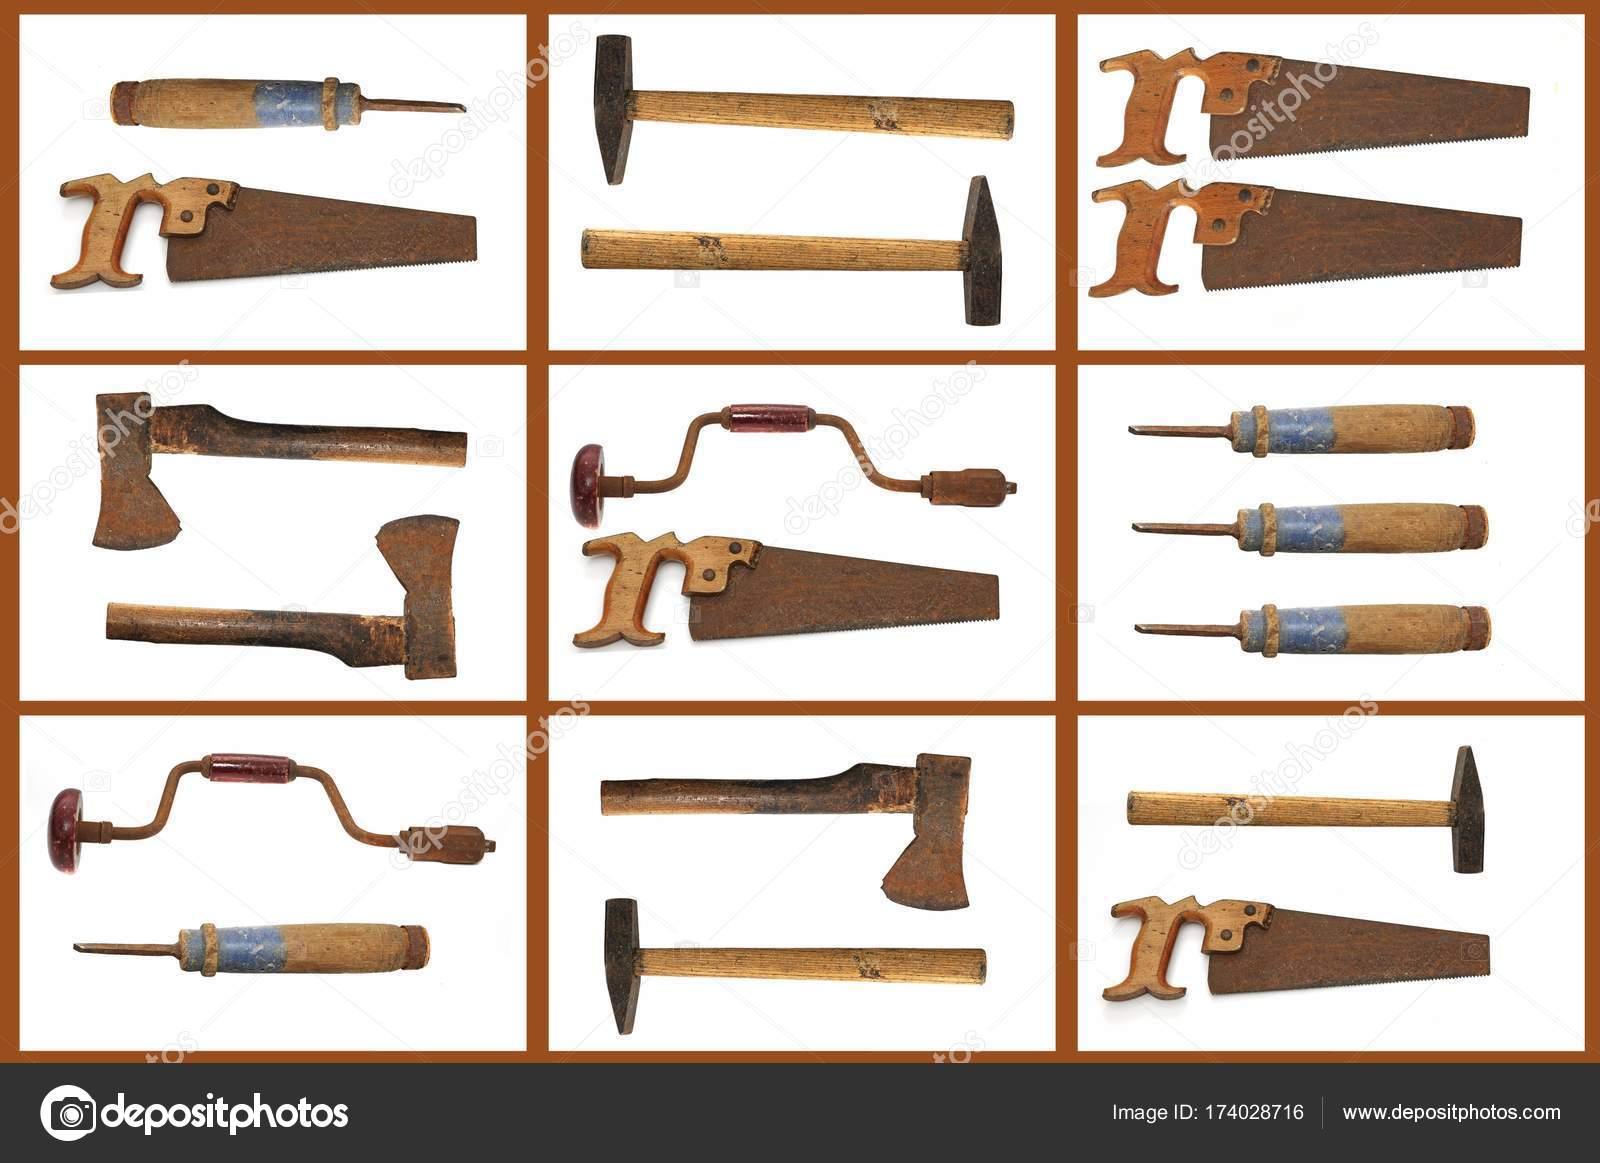 Old Handicrafts Tools Collage Stock Photo C Imagebrokermicrostock